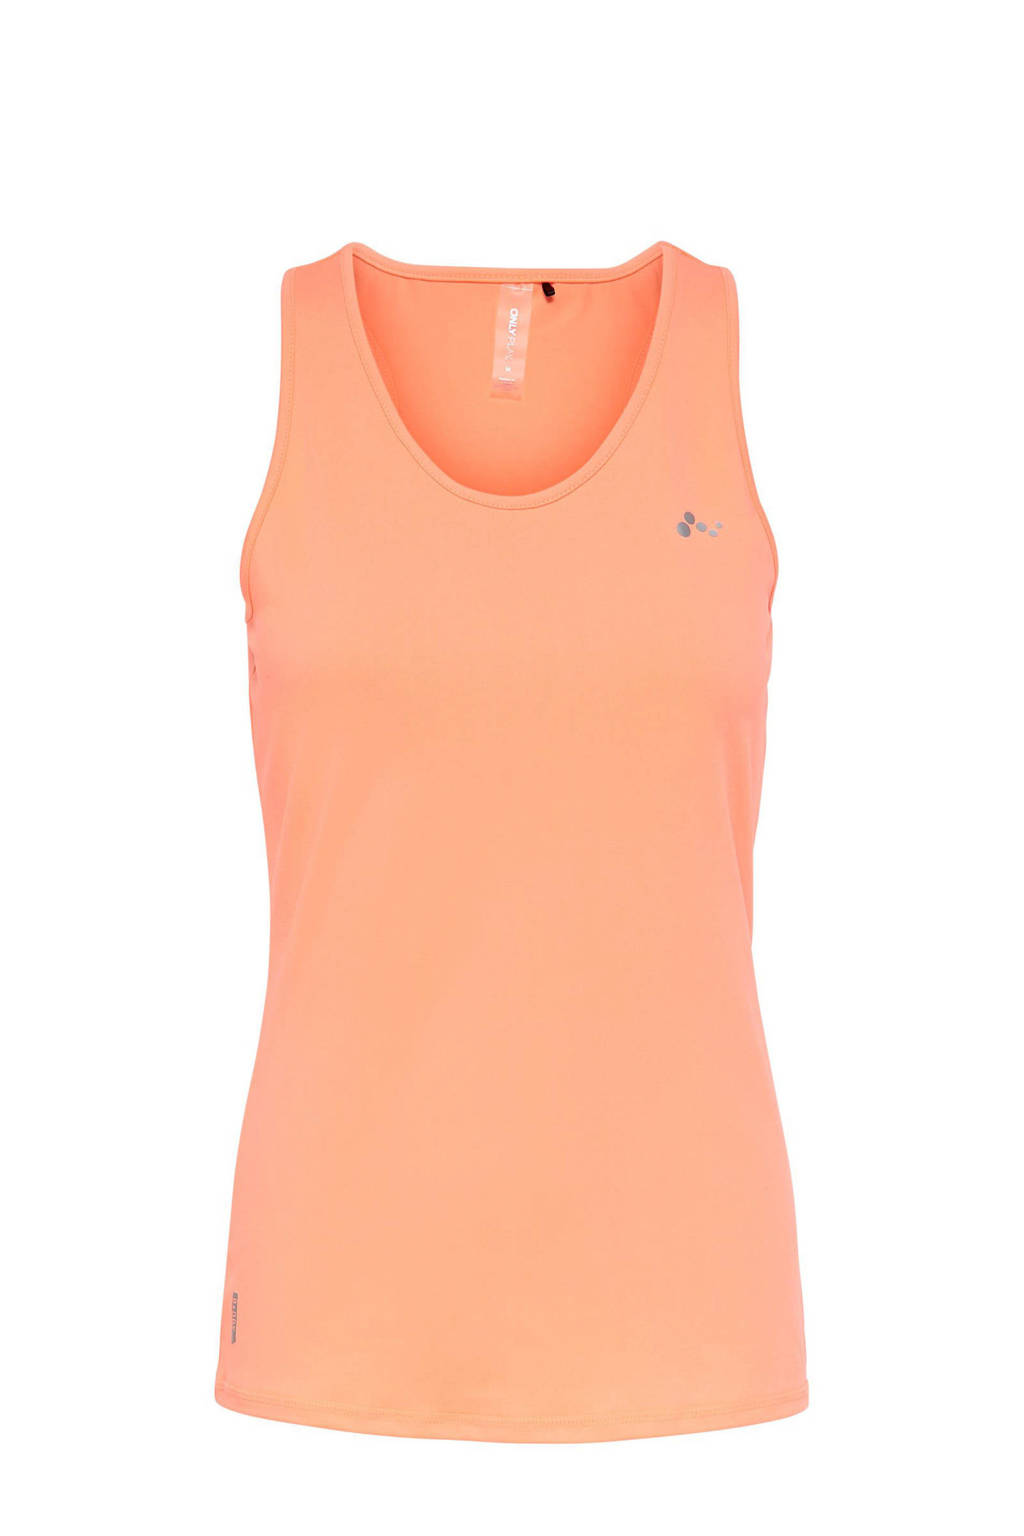 ONLY PLAY sporttop Clarisa oranje, Oranje